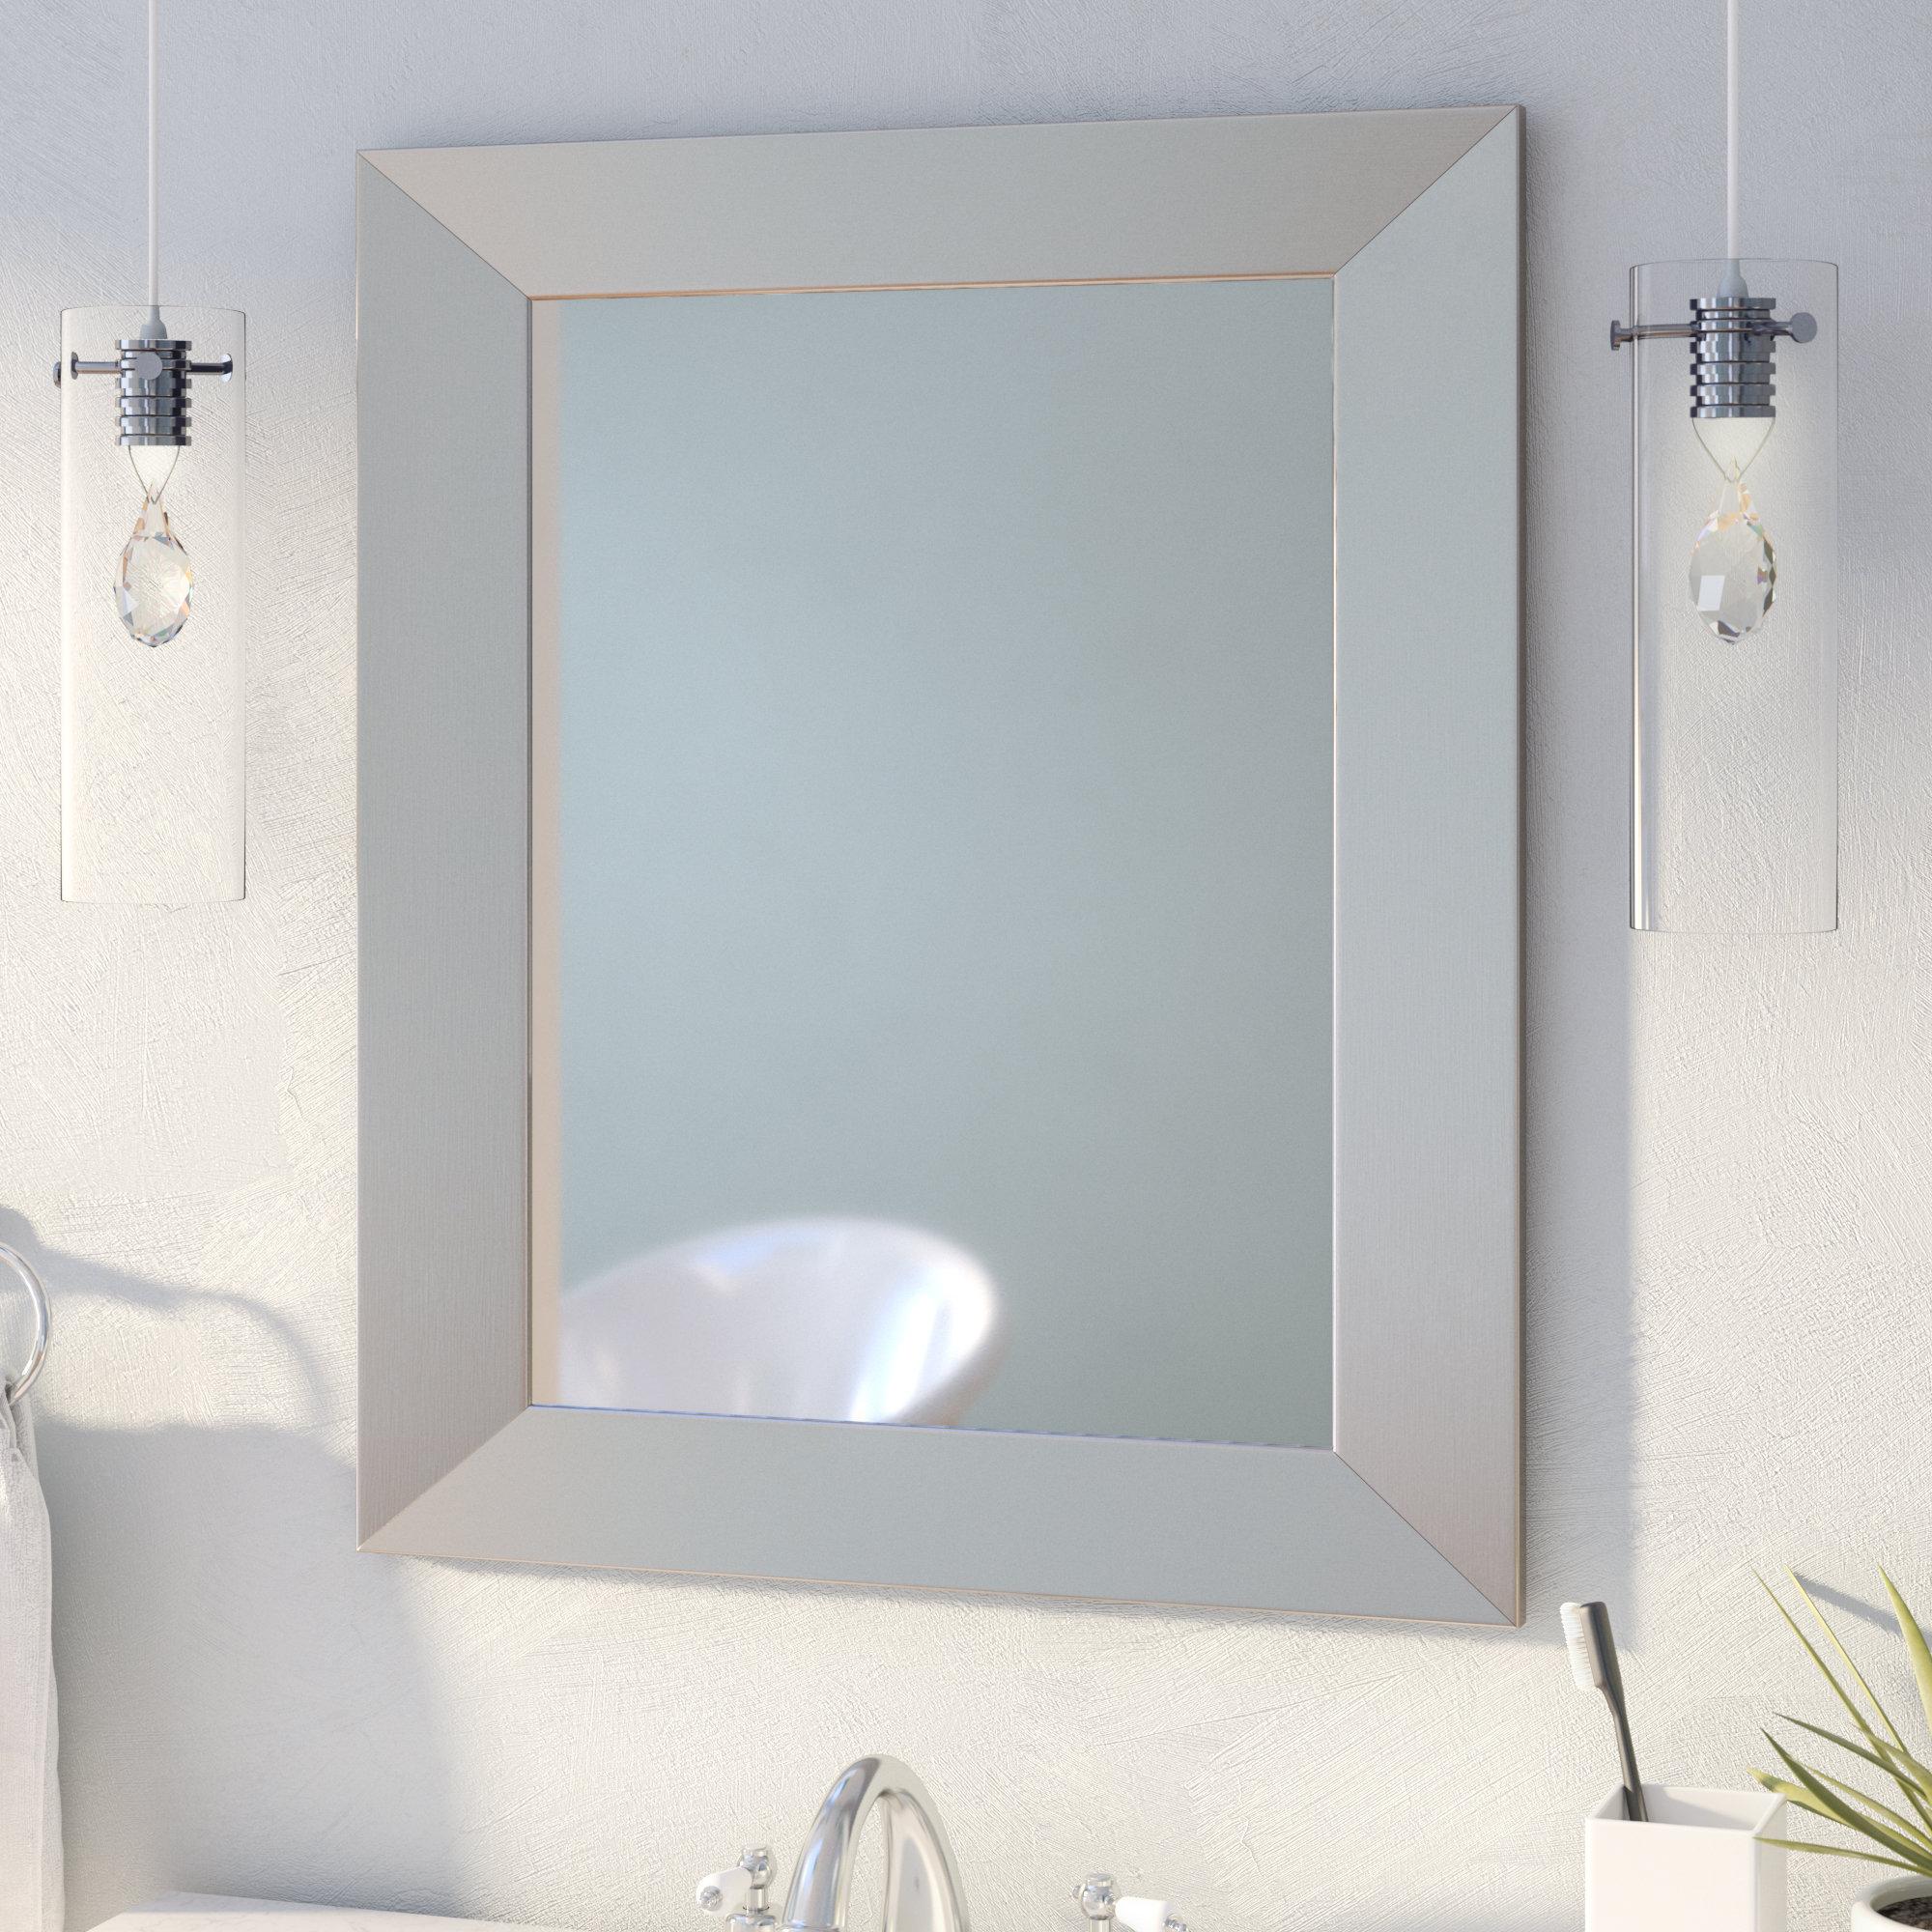 Northend Wall Mirrors Inside Newest Kurt Modern & Contemporary Wall Mirror (Gallery 16 of 20)